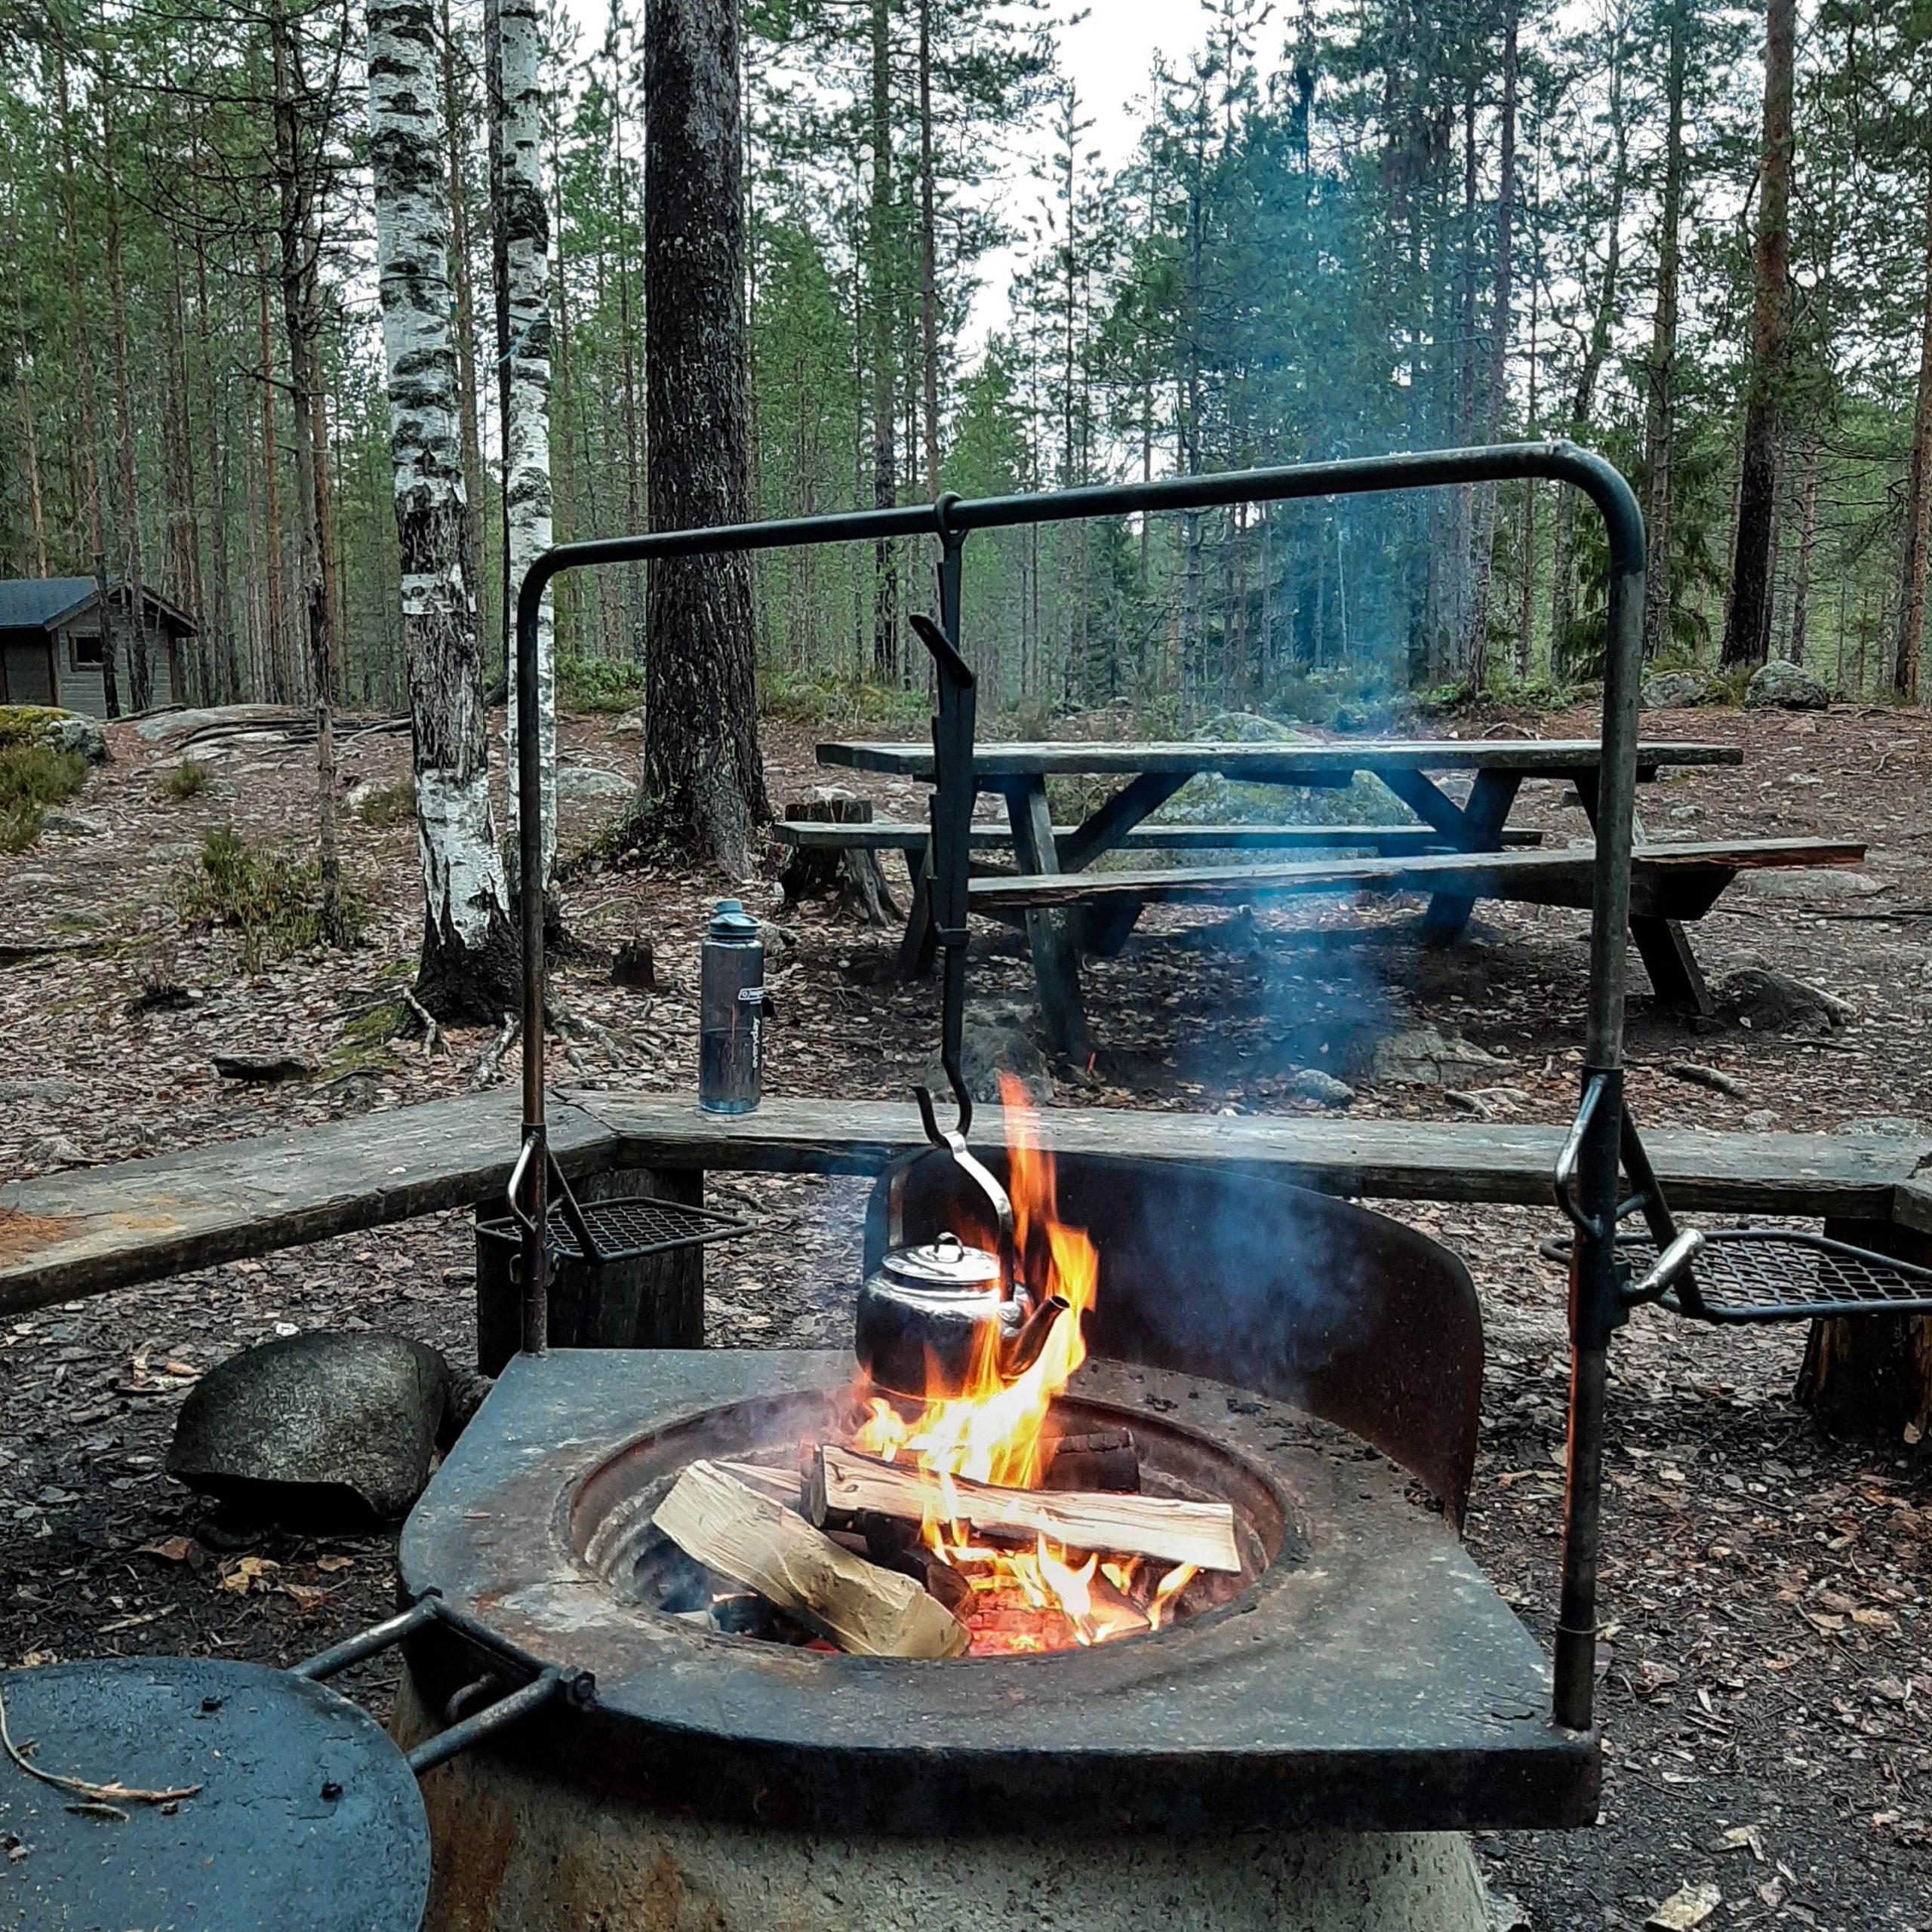 How to build a campfire 101